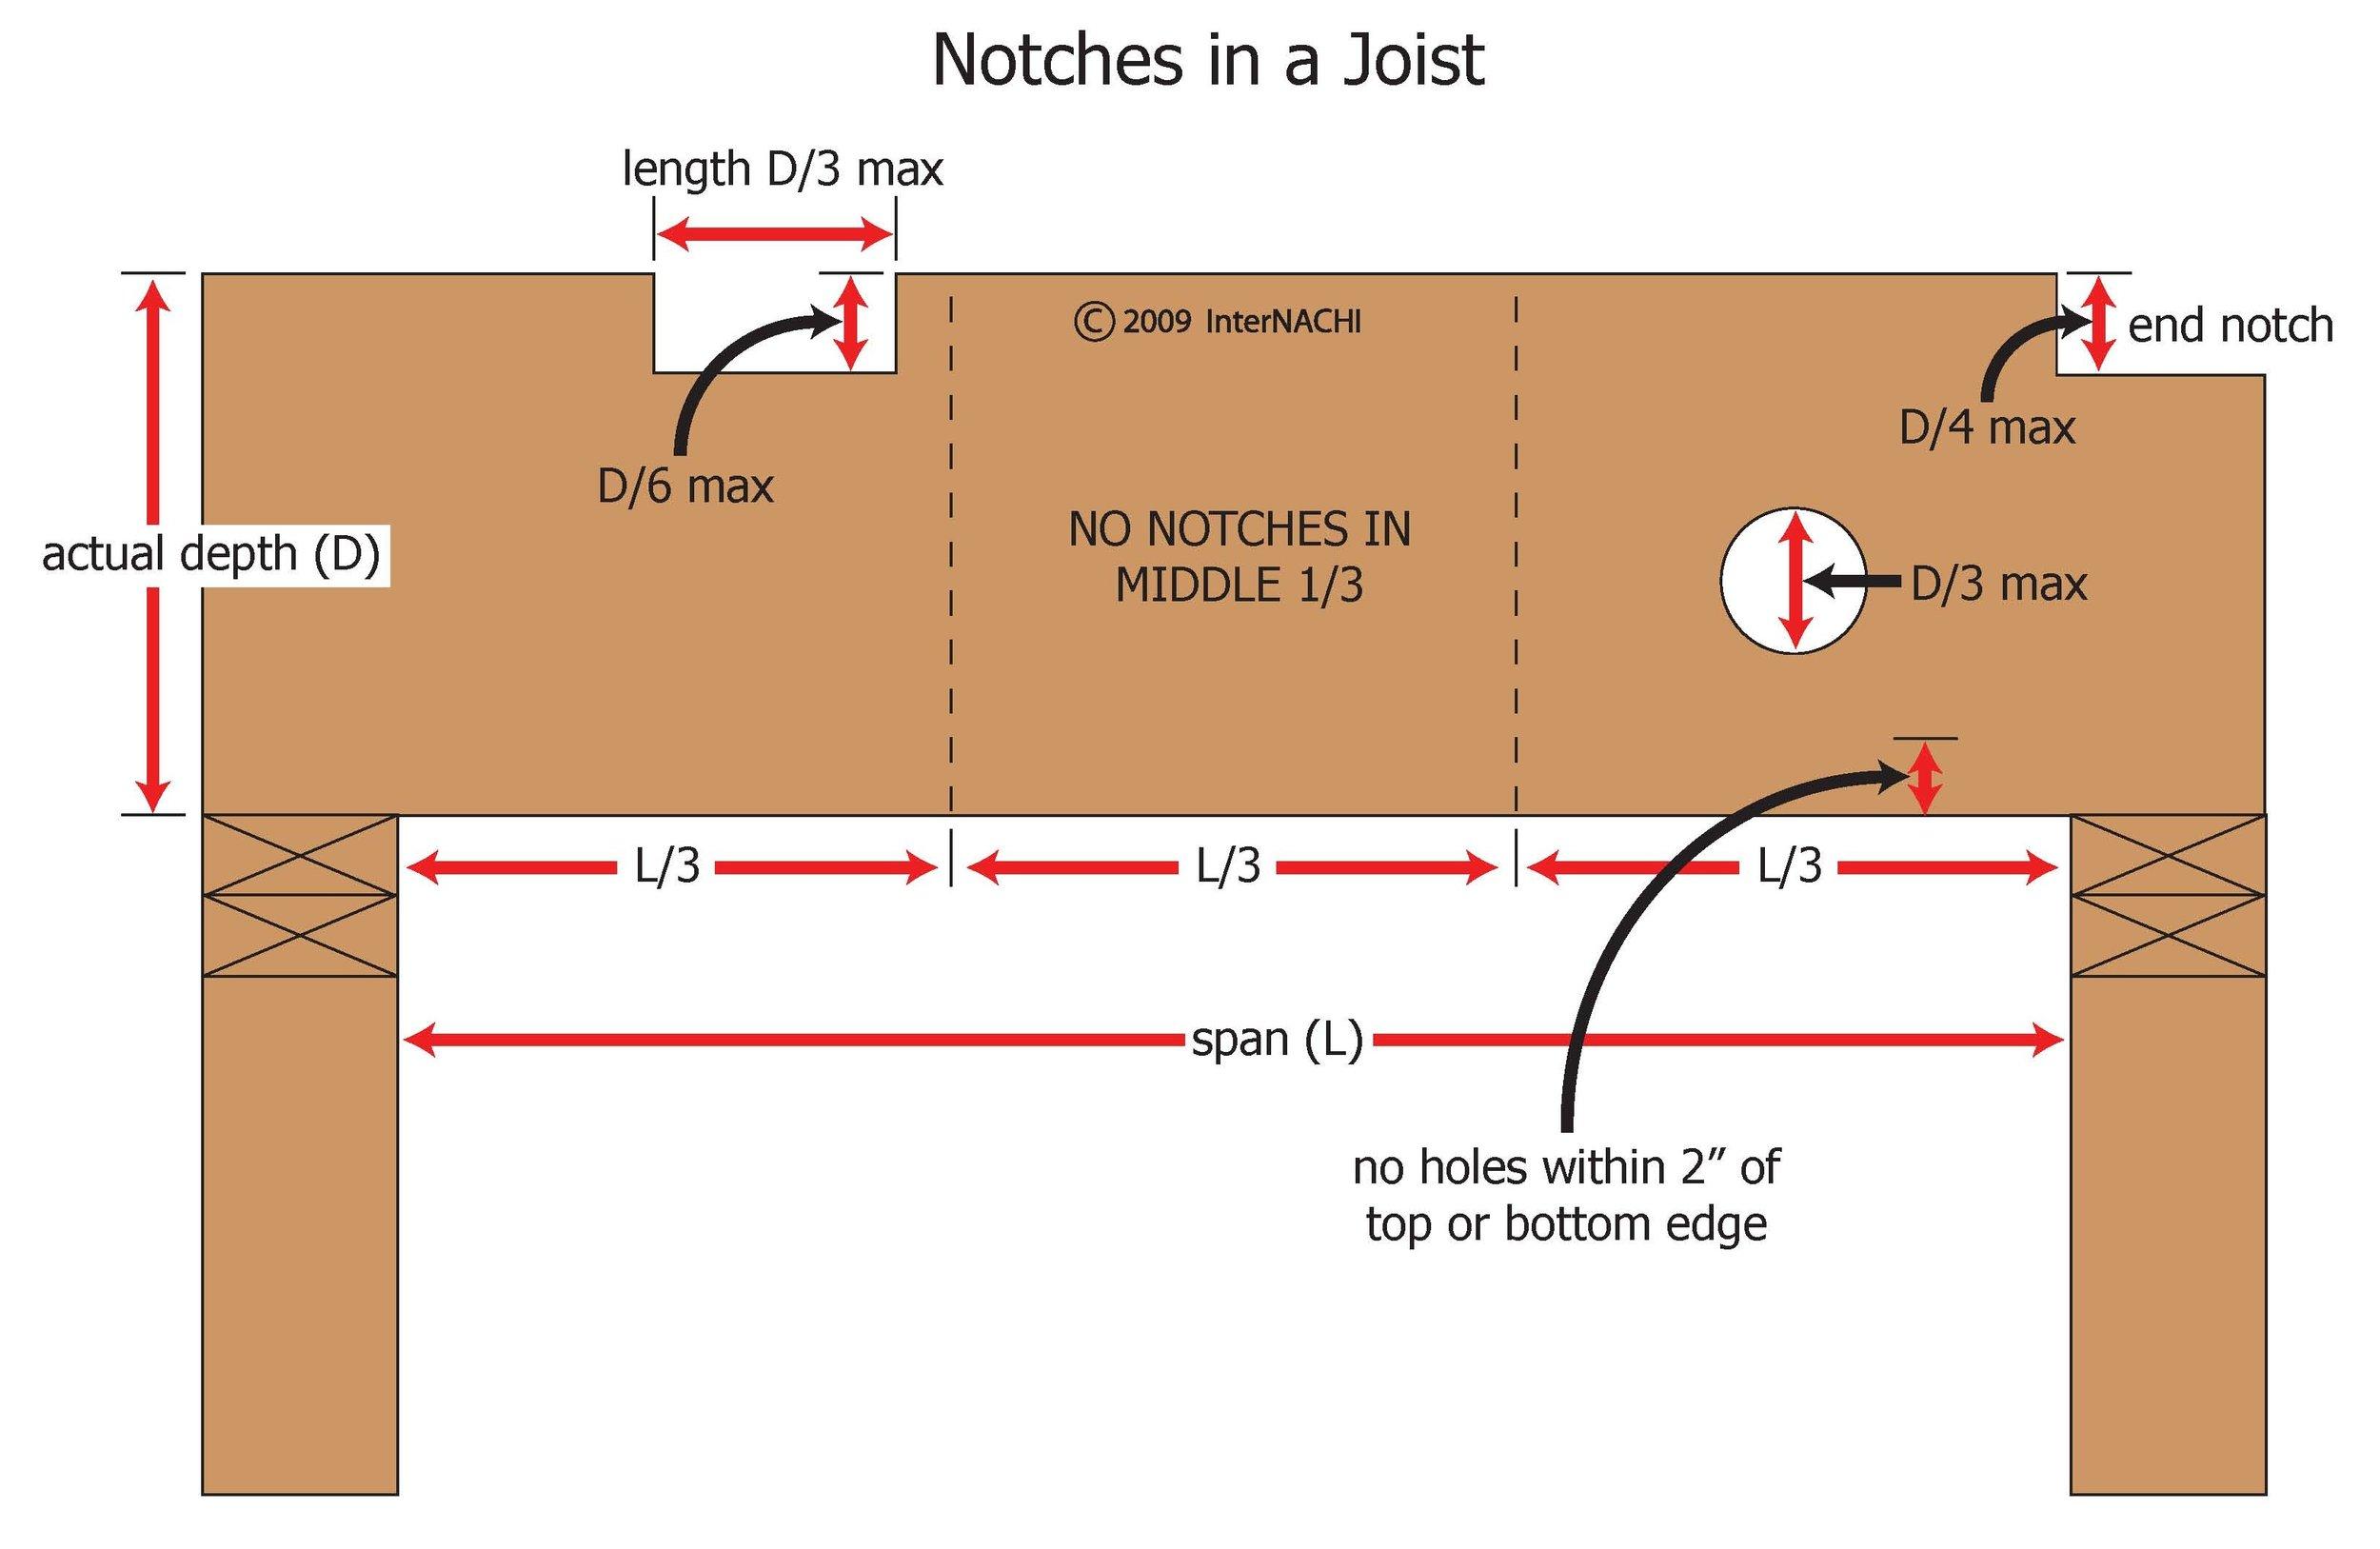 Notches in joist